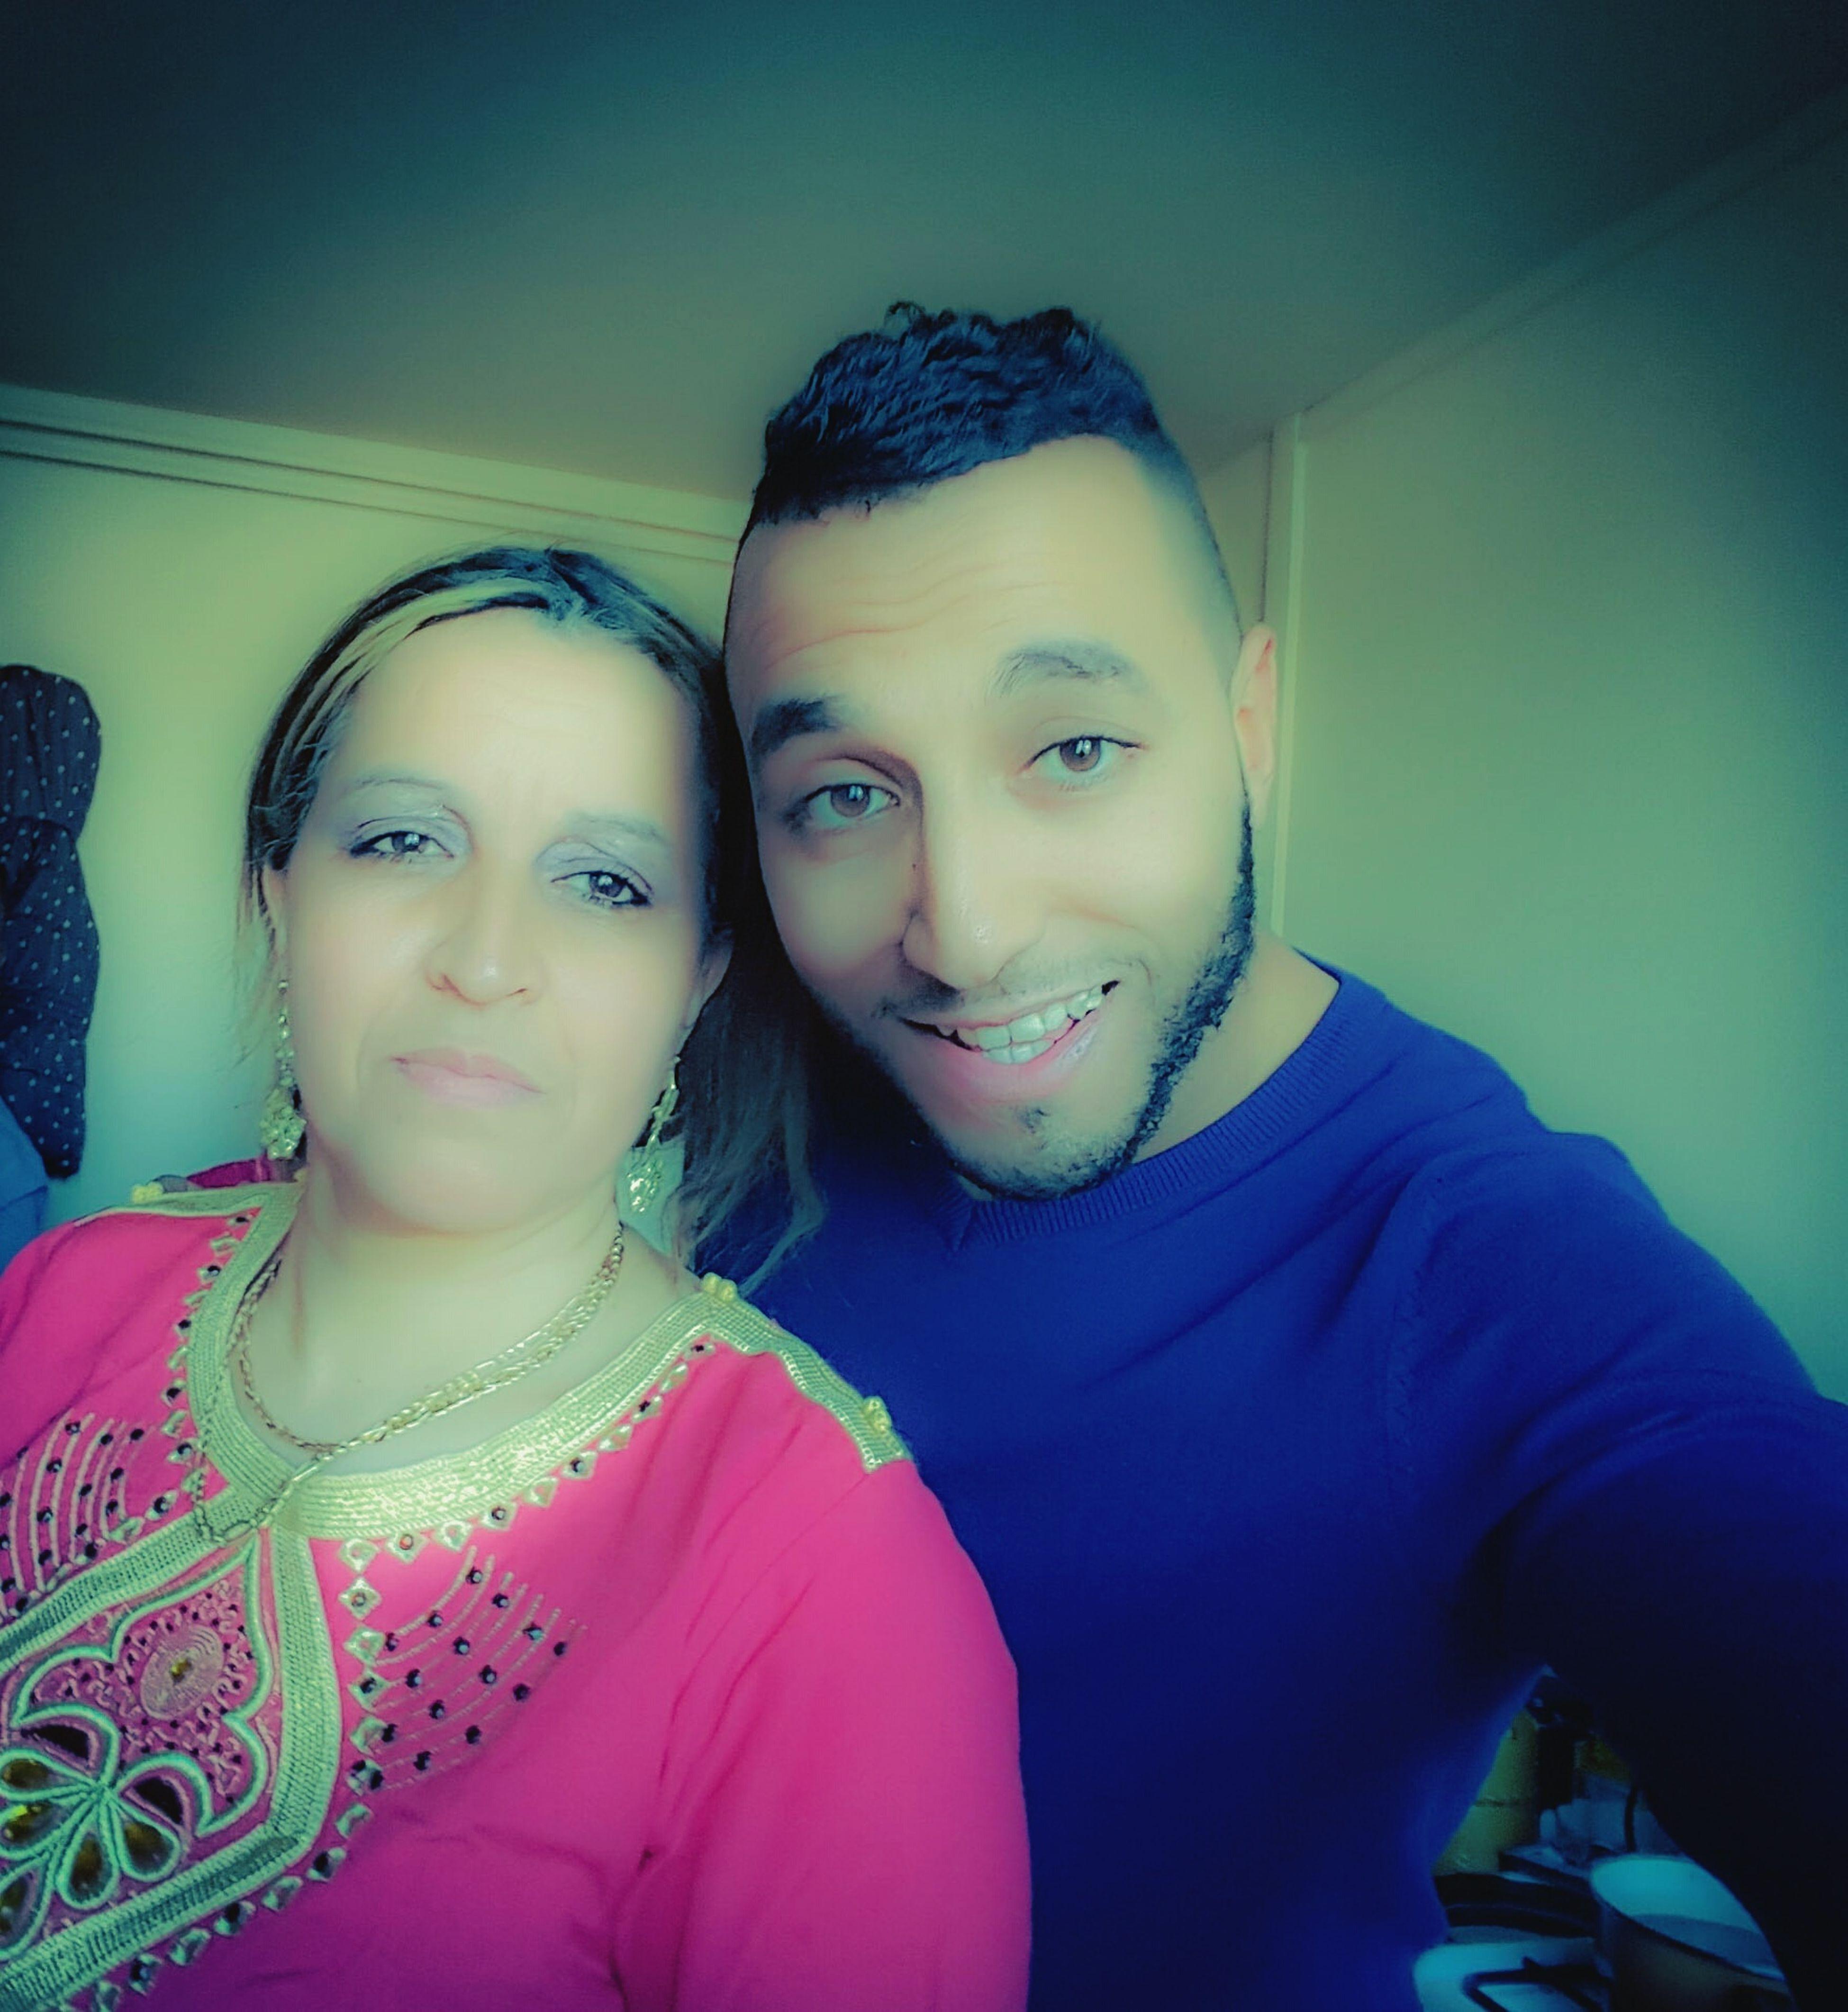 I LOVE YOU SO MUCH ❤❤❤ mum